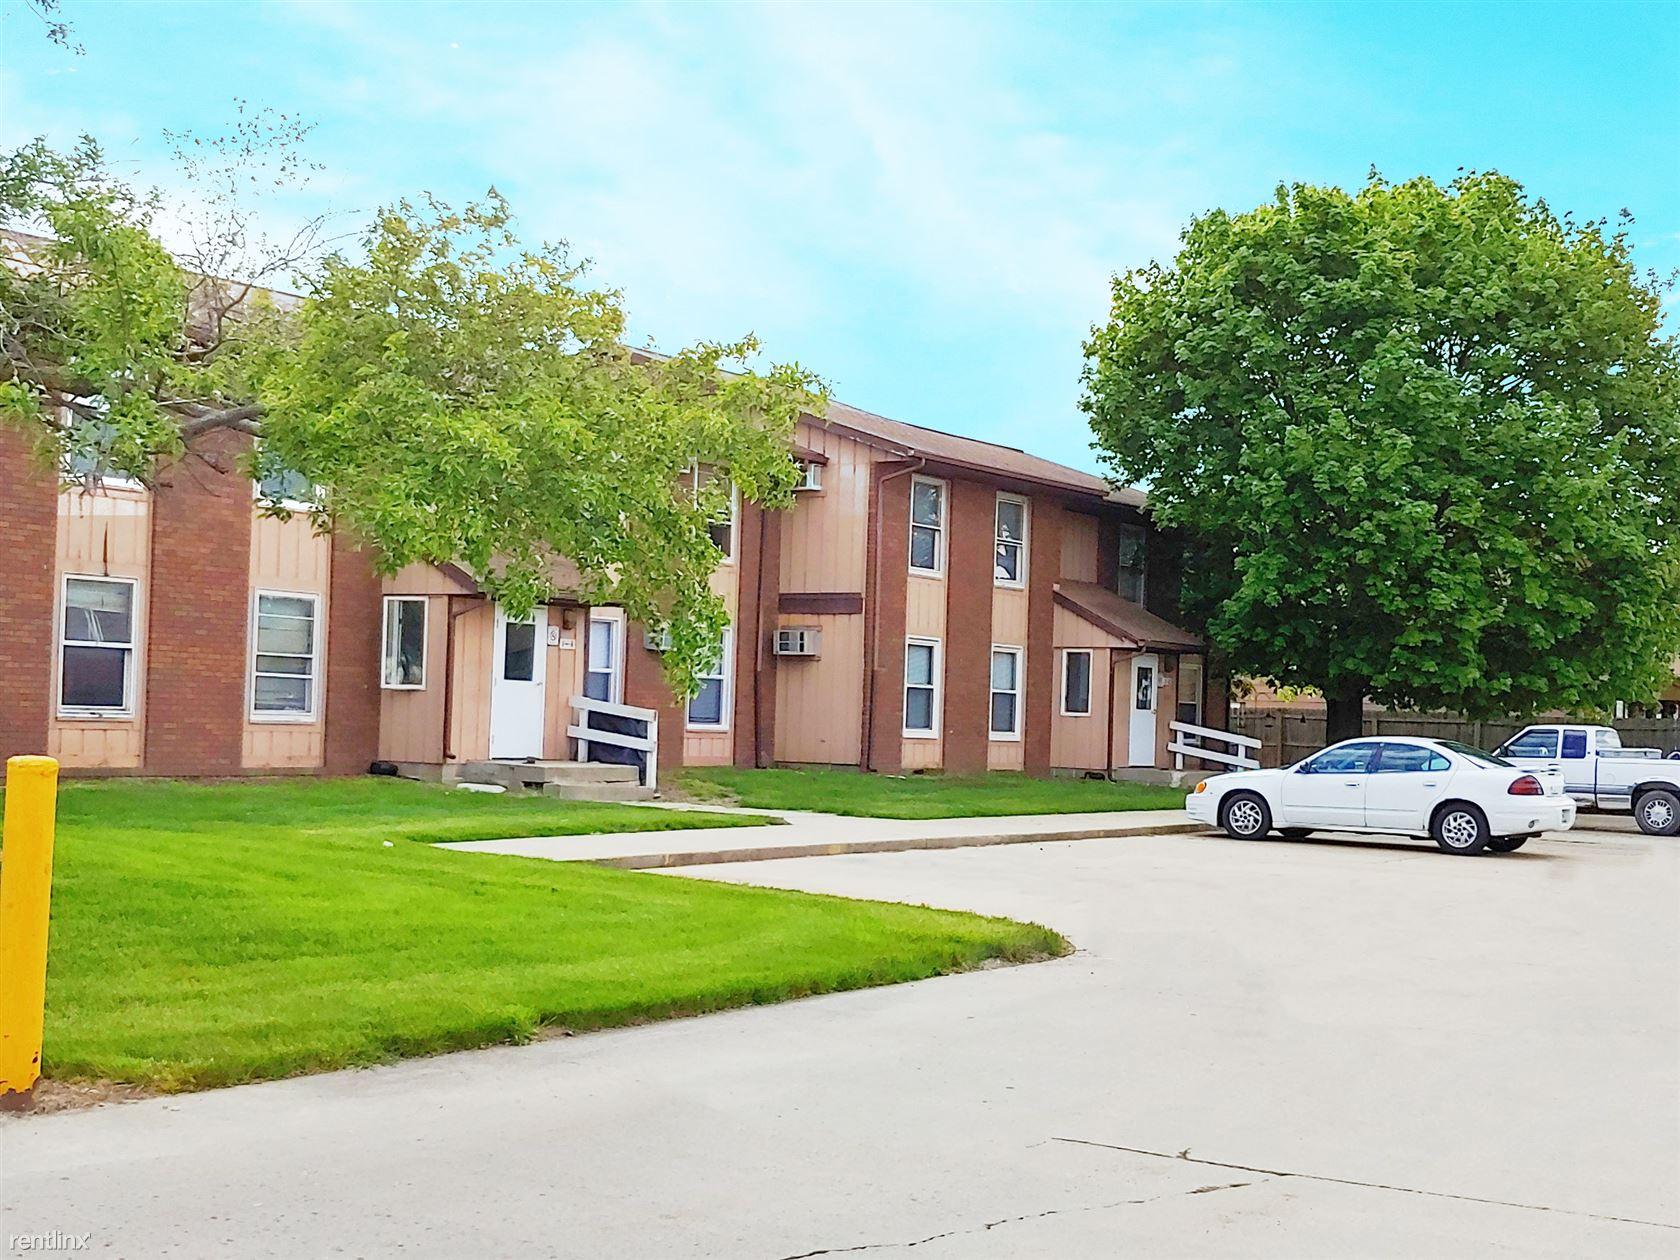 2305 Railsplitter Ave, Lincoln, IL - $550 USD/ month